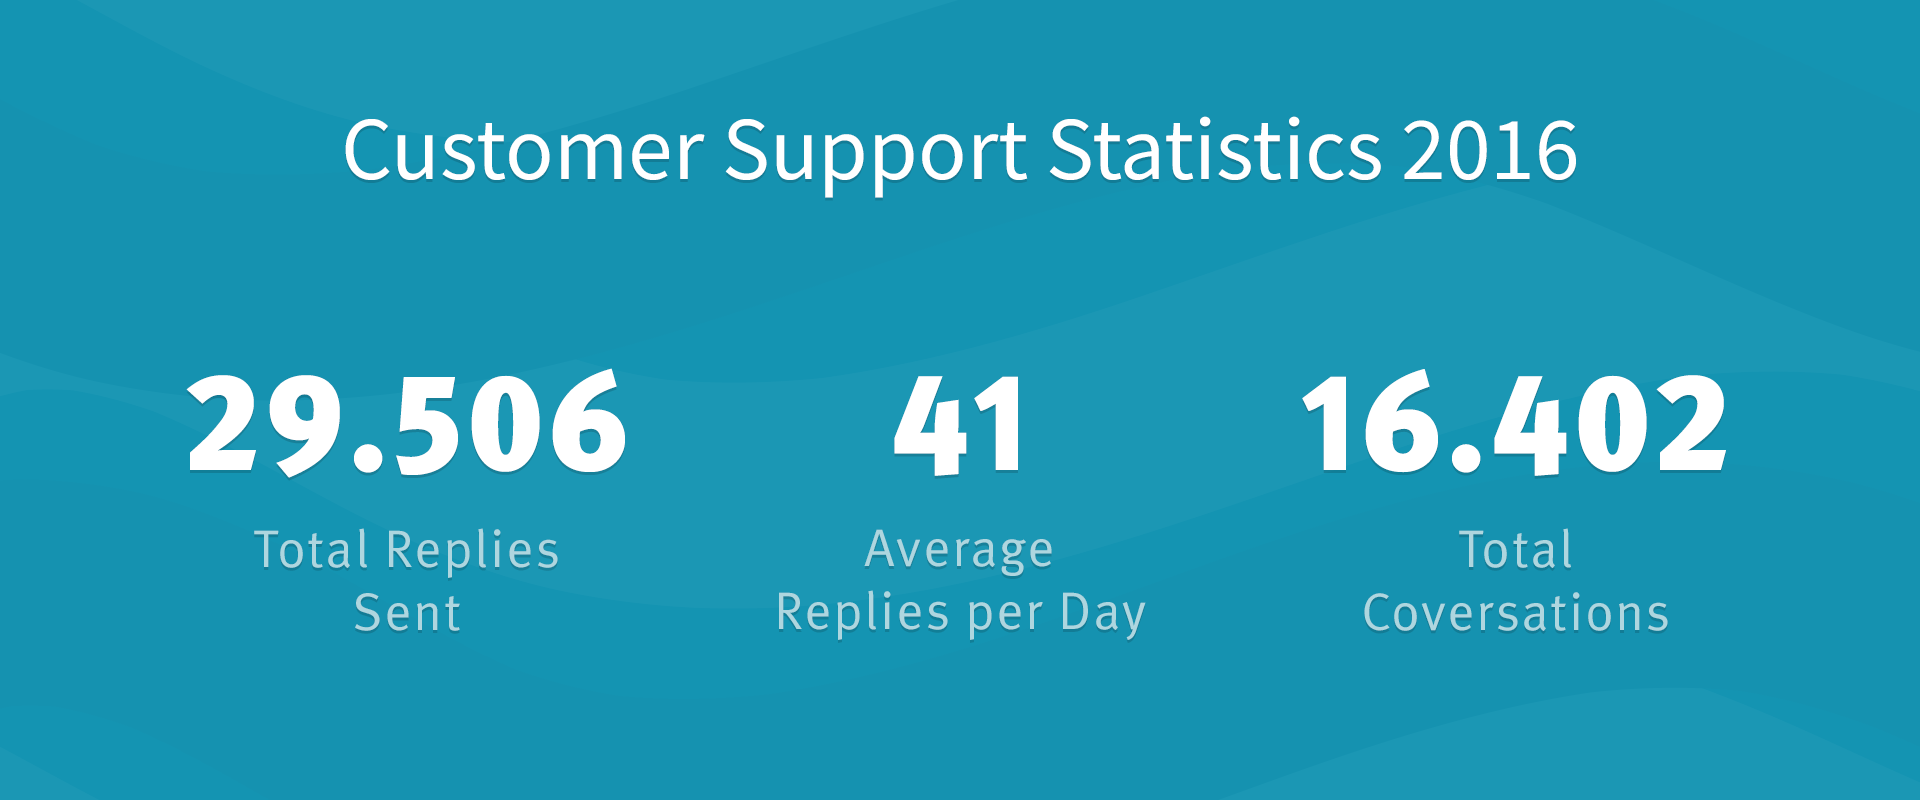 customer-statistics-2016-1